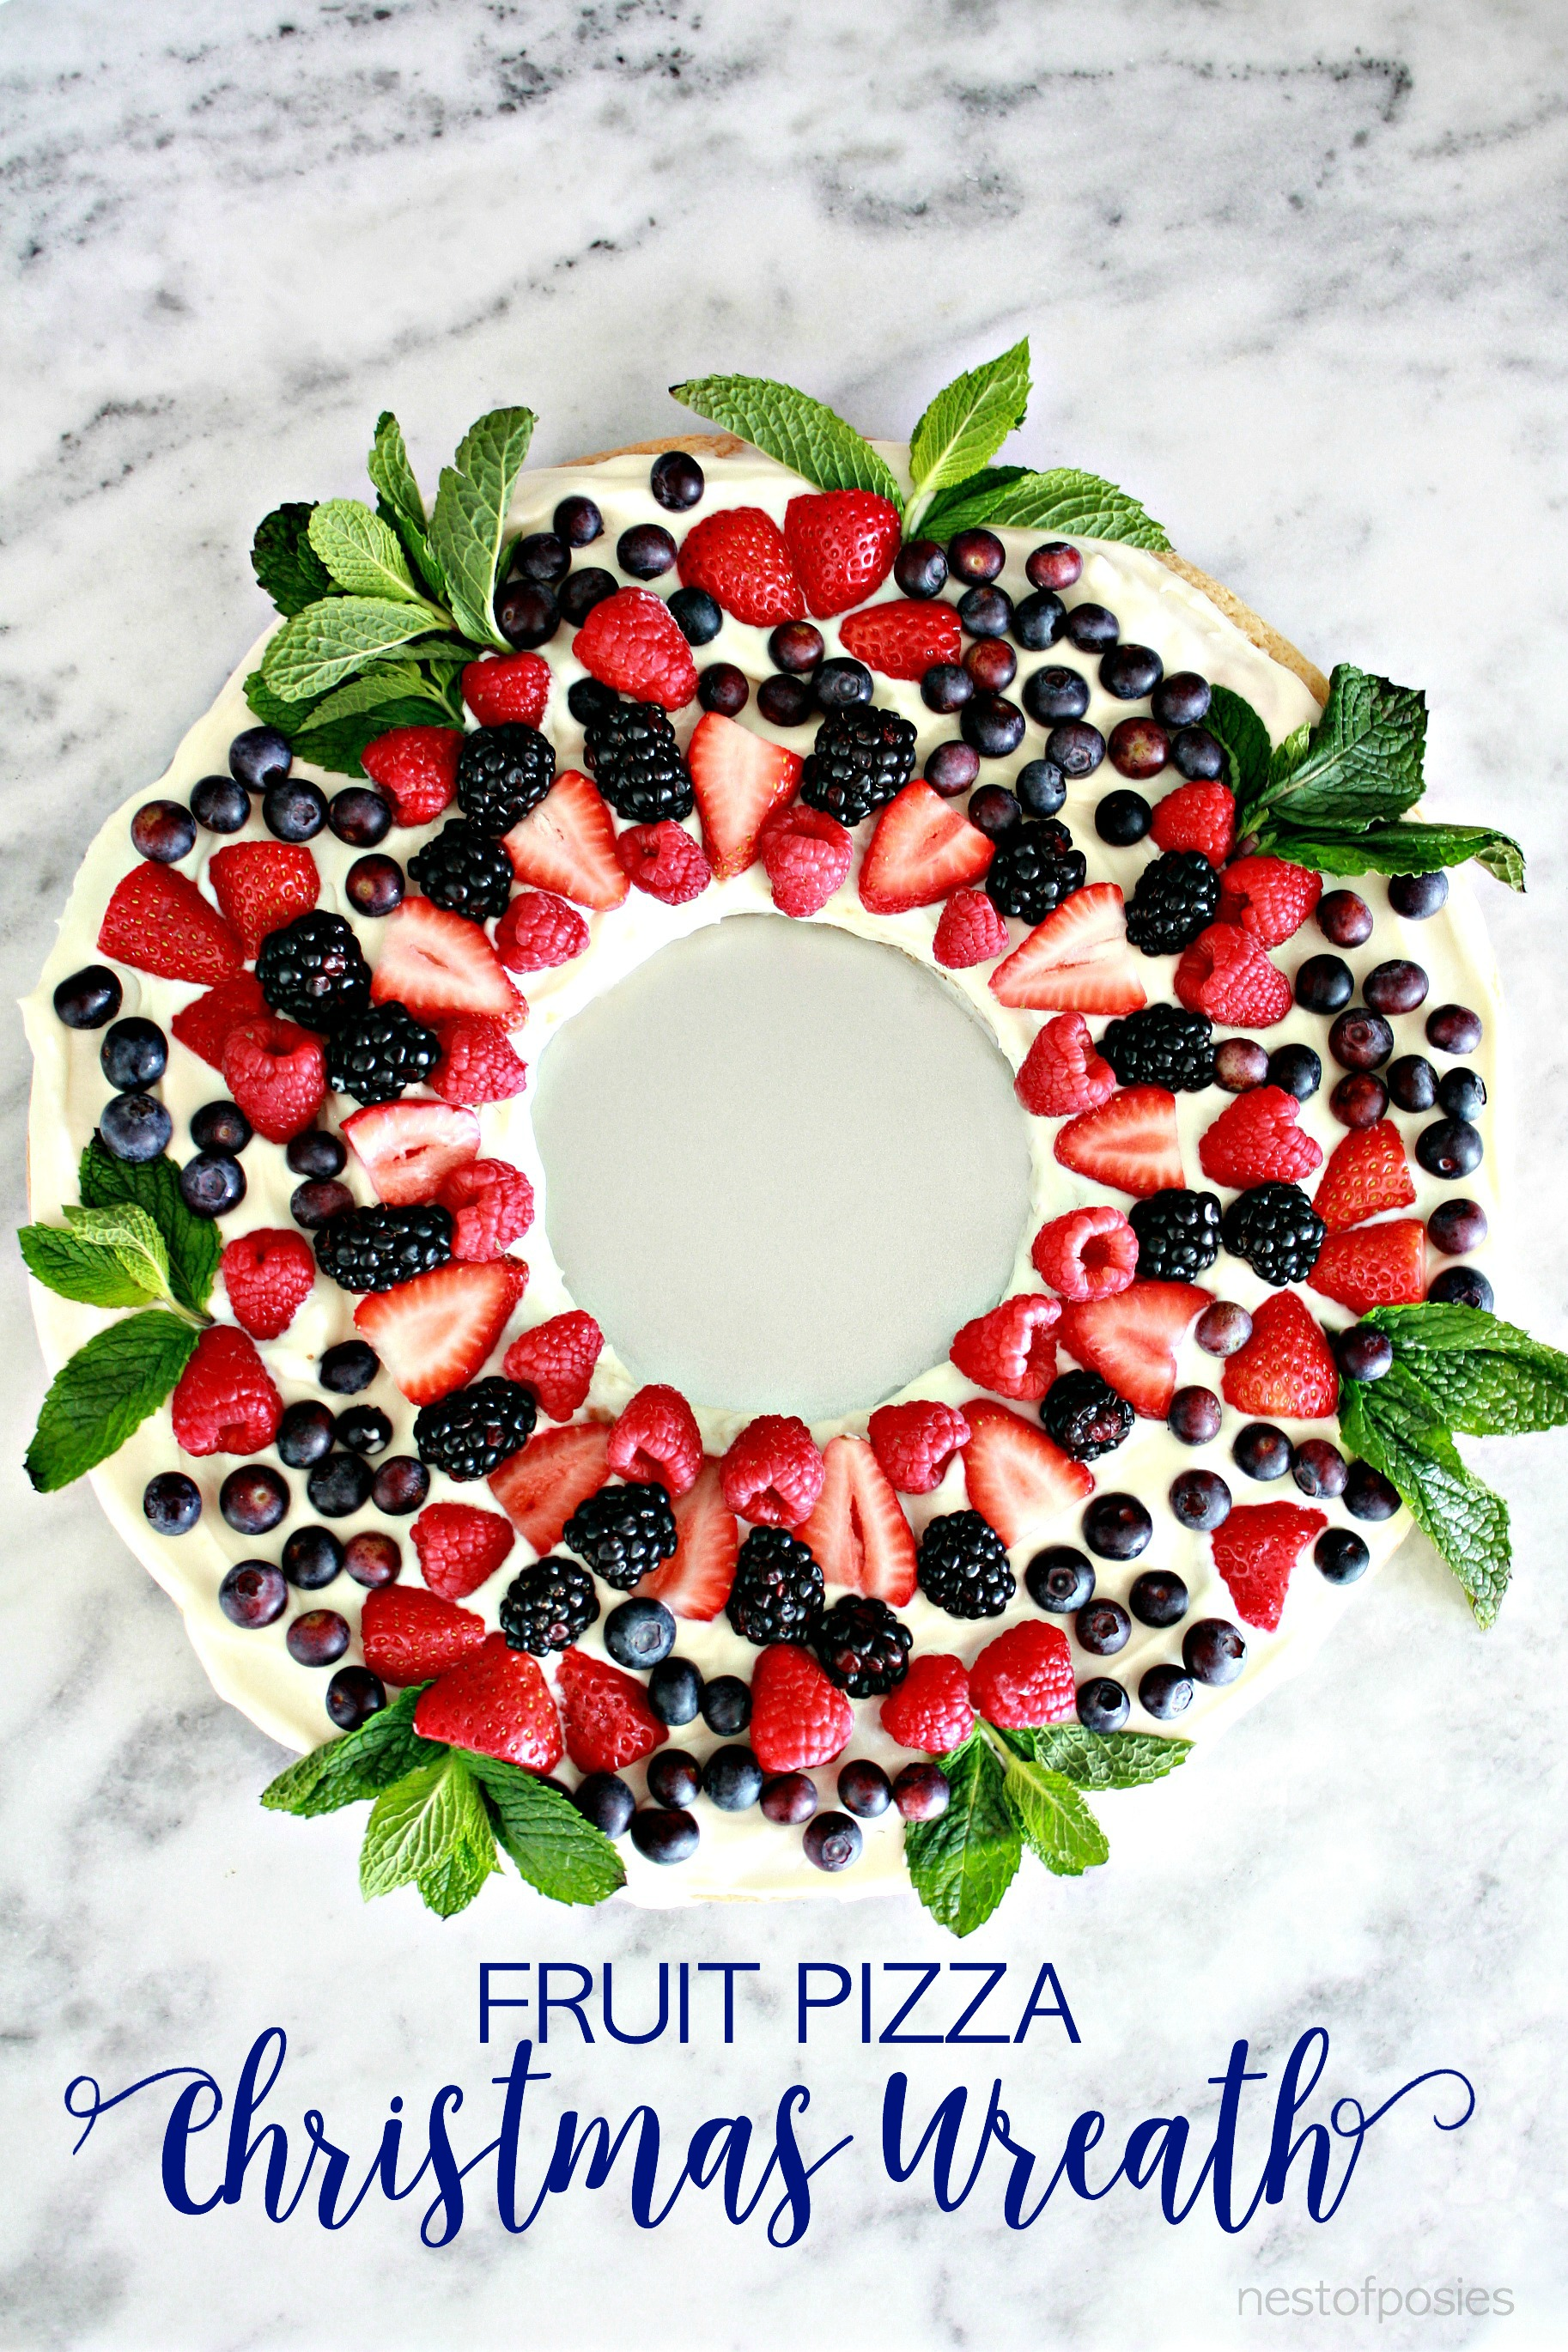 Fruit-Pizza-Christmas-Wreath-so-delicious-and-festive.jpg